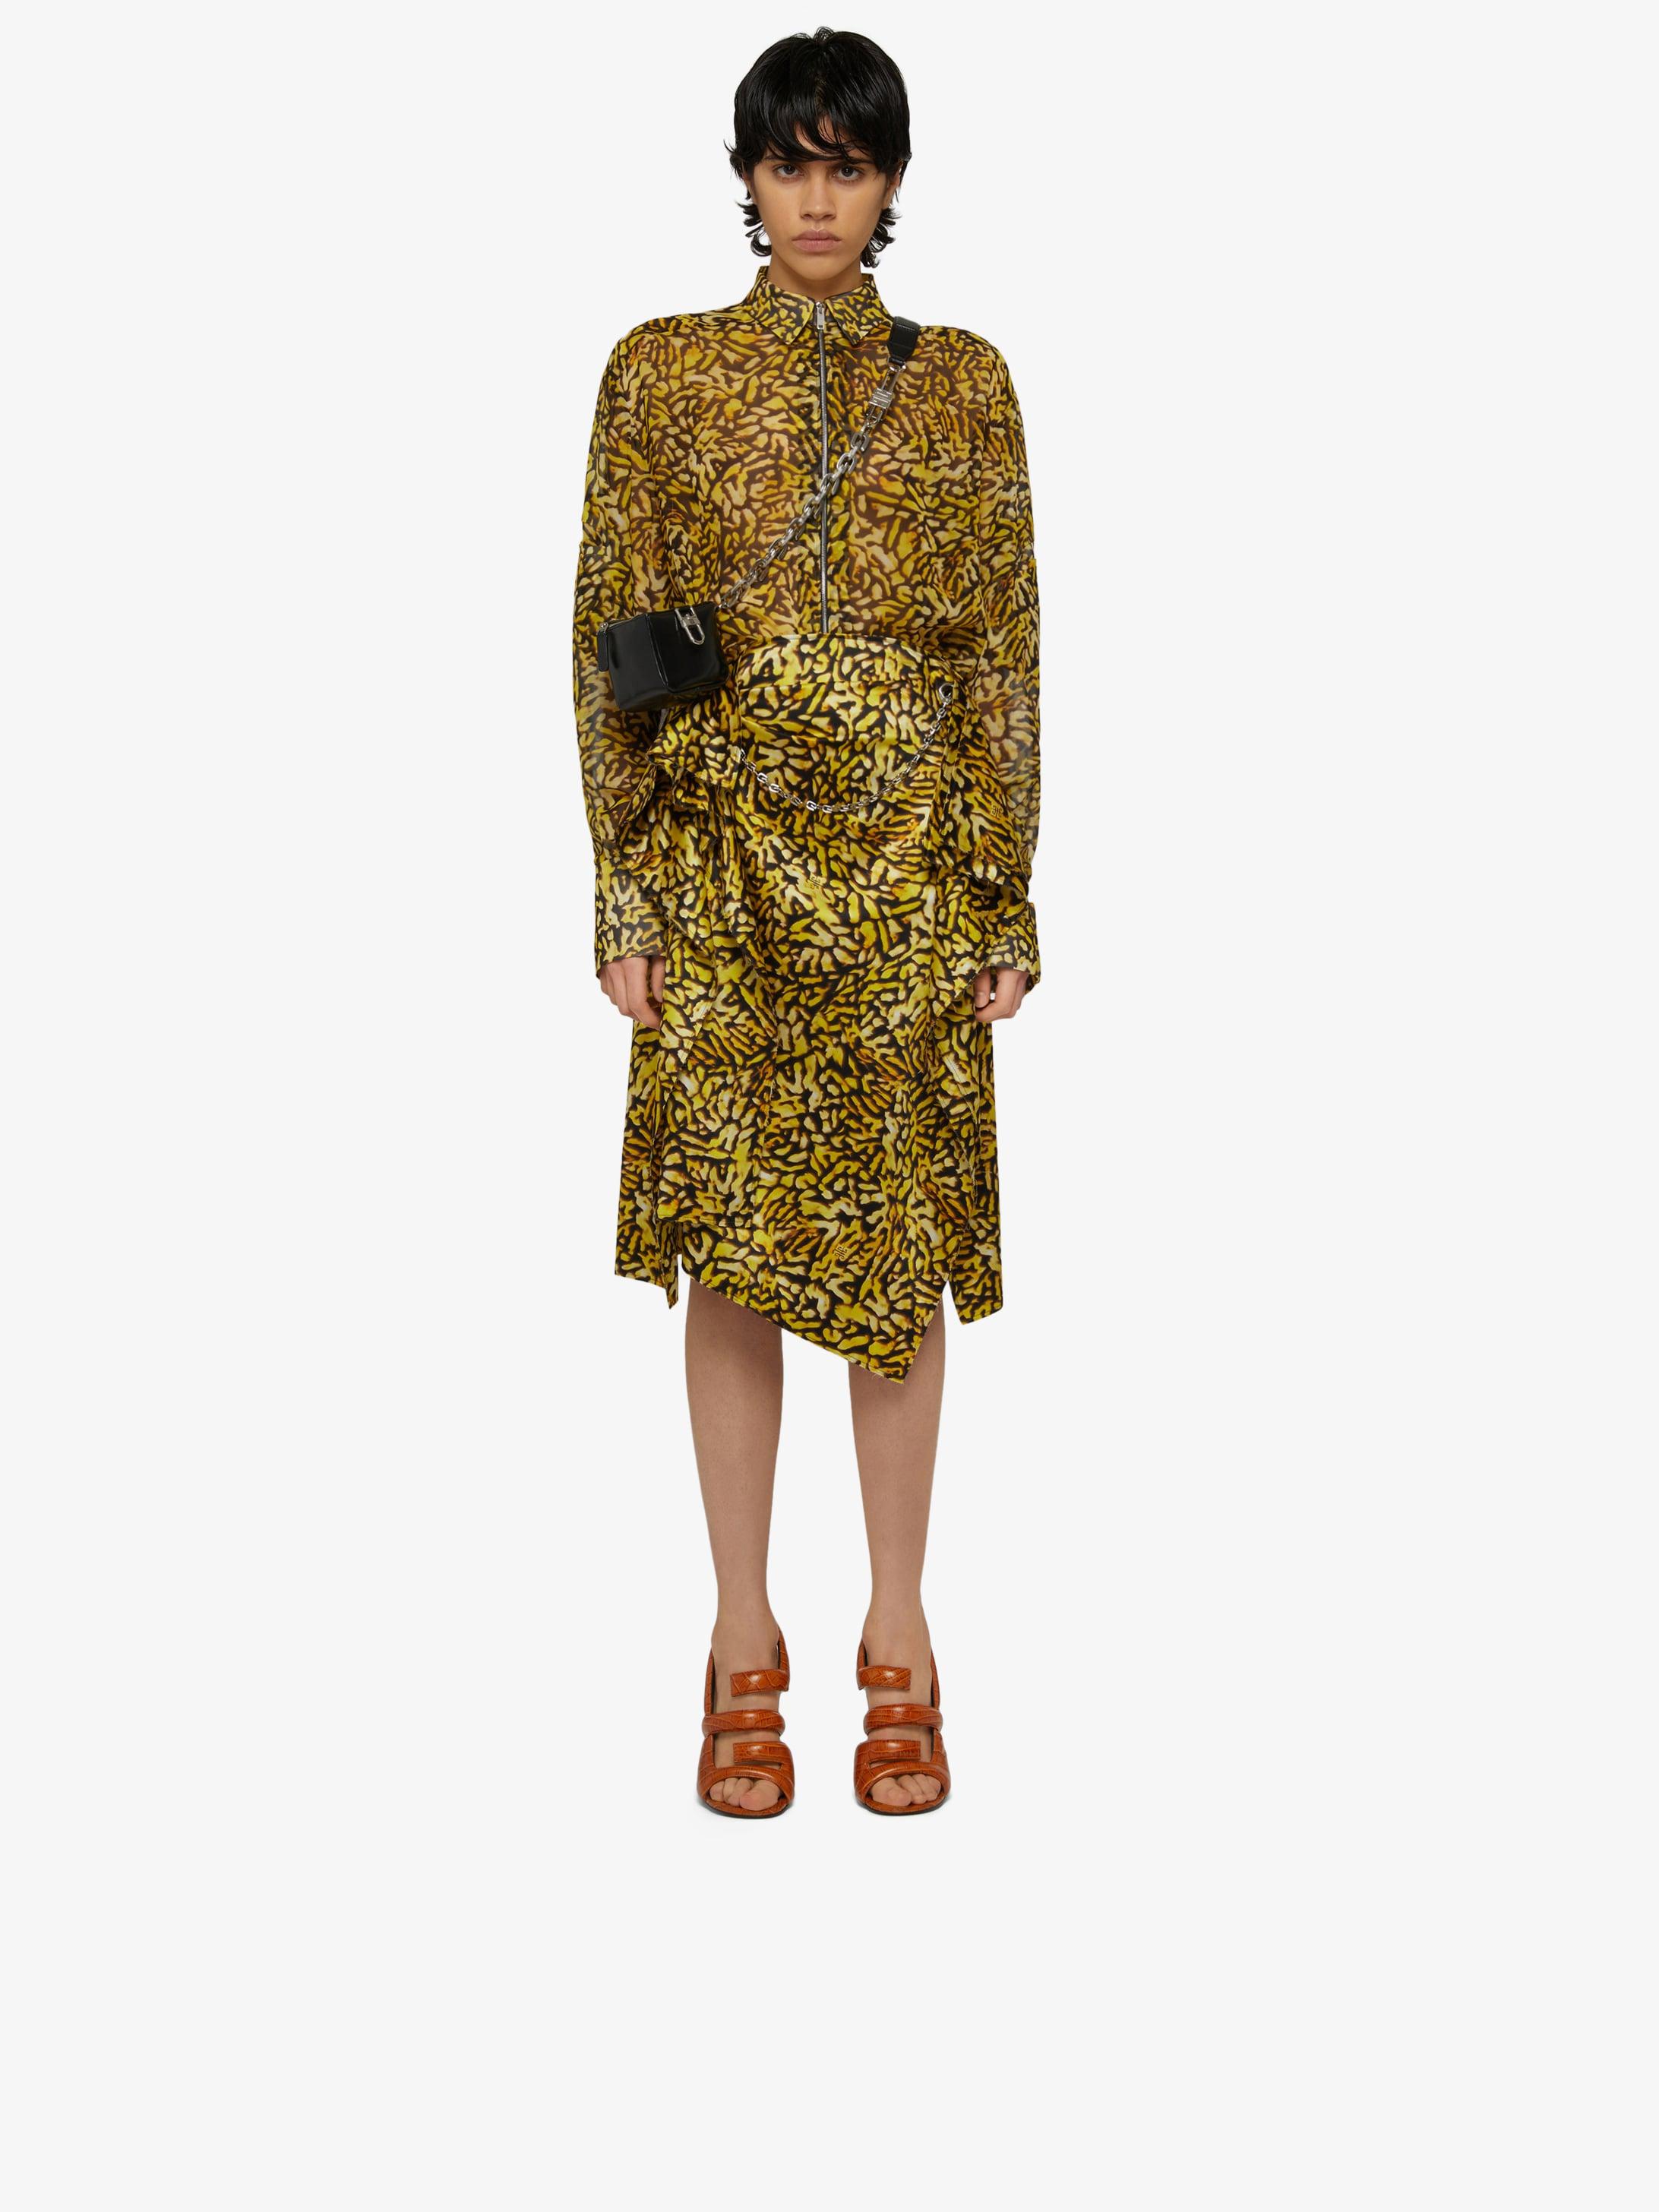 Asymmetrical printed skirt with metallic details